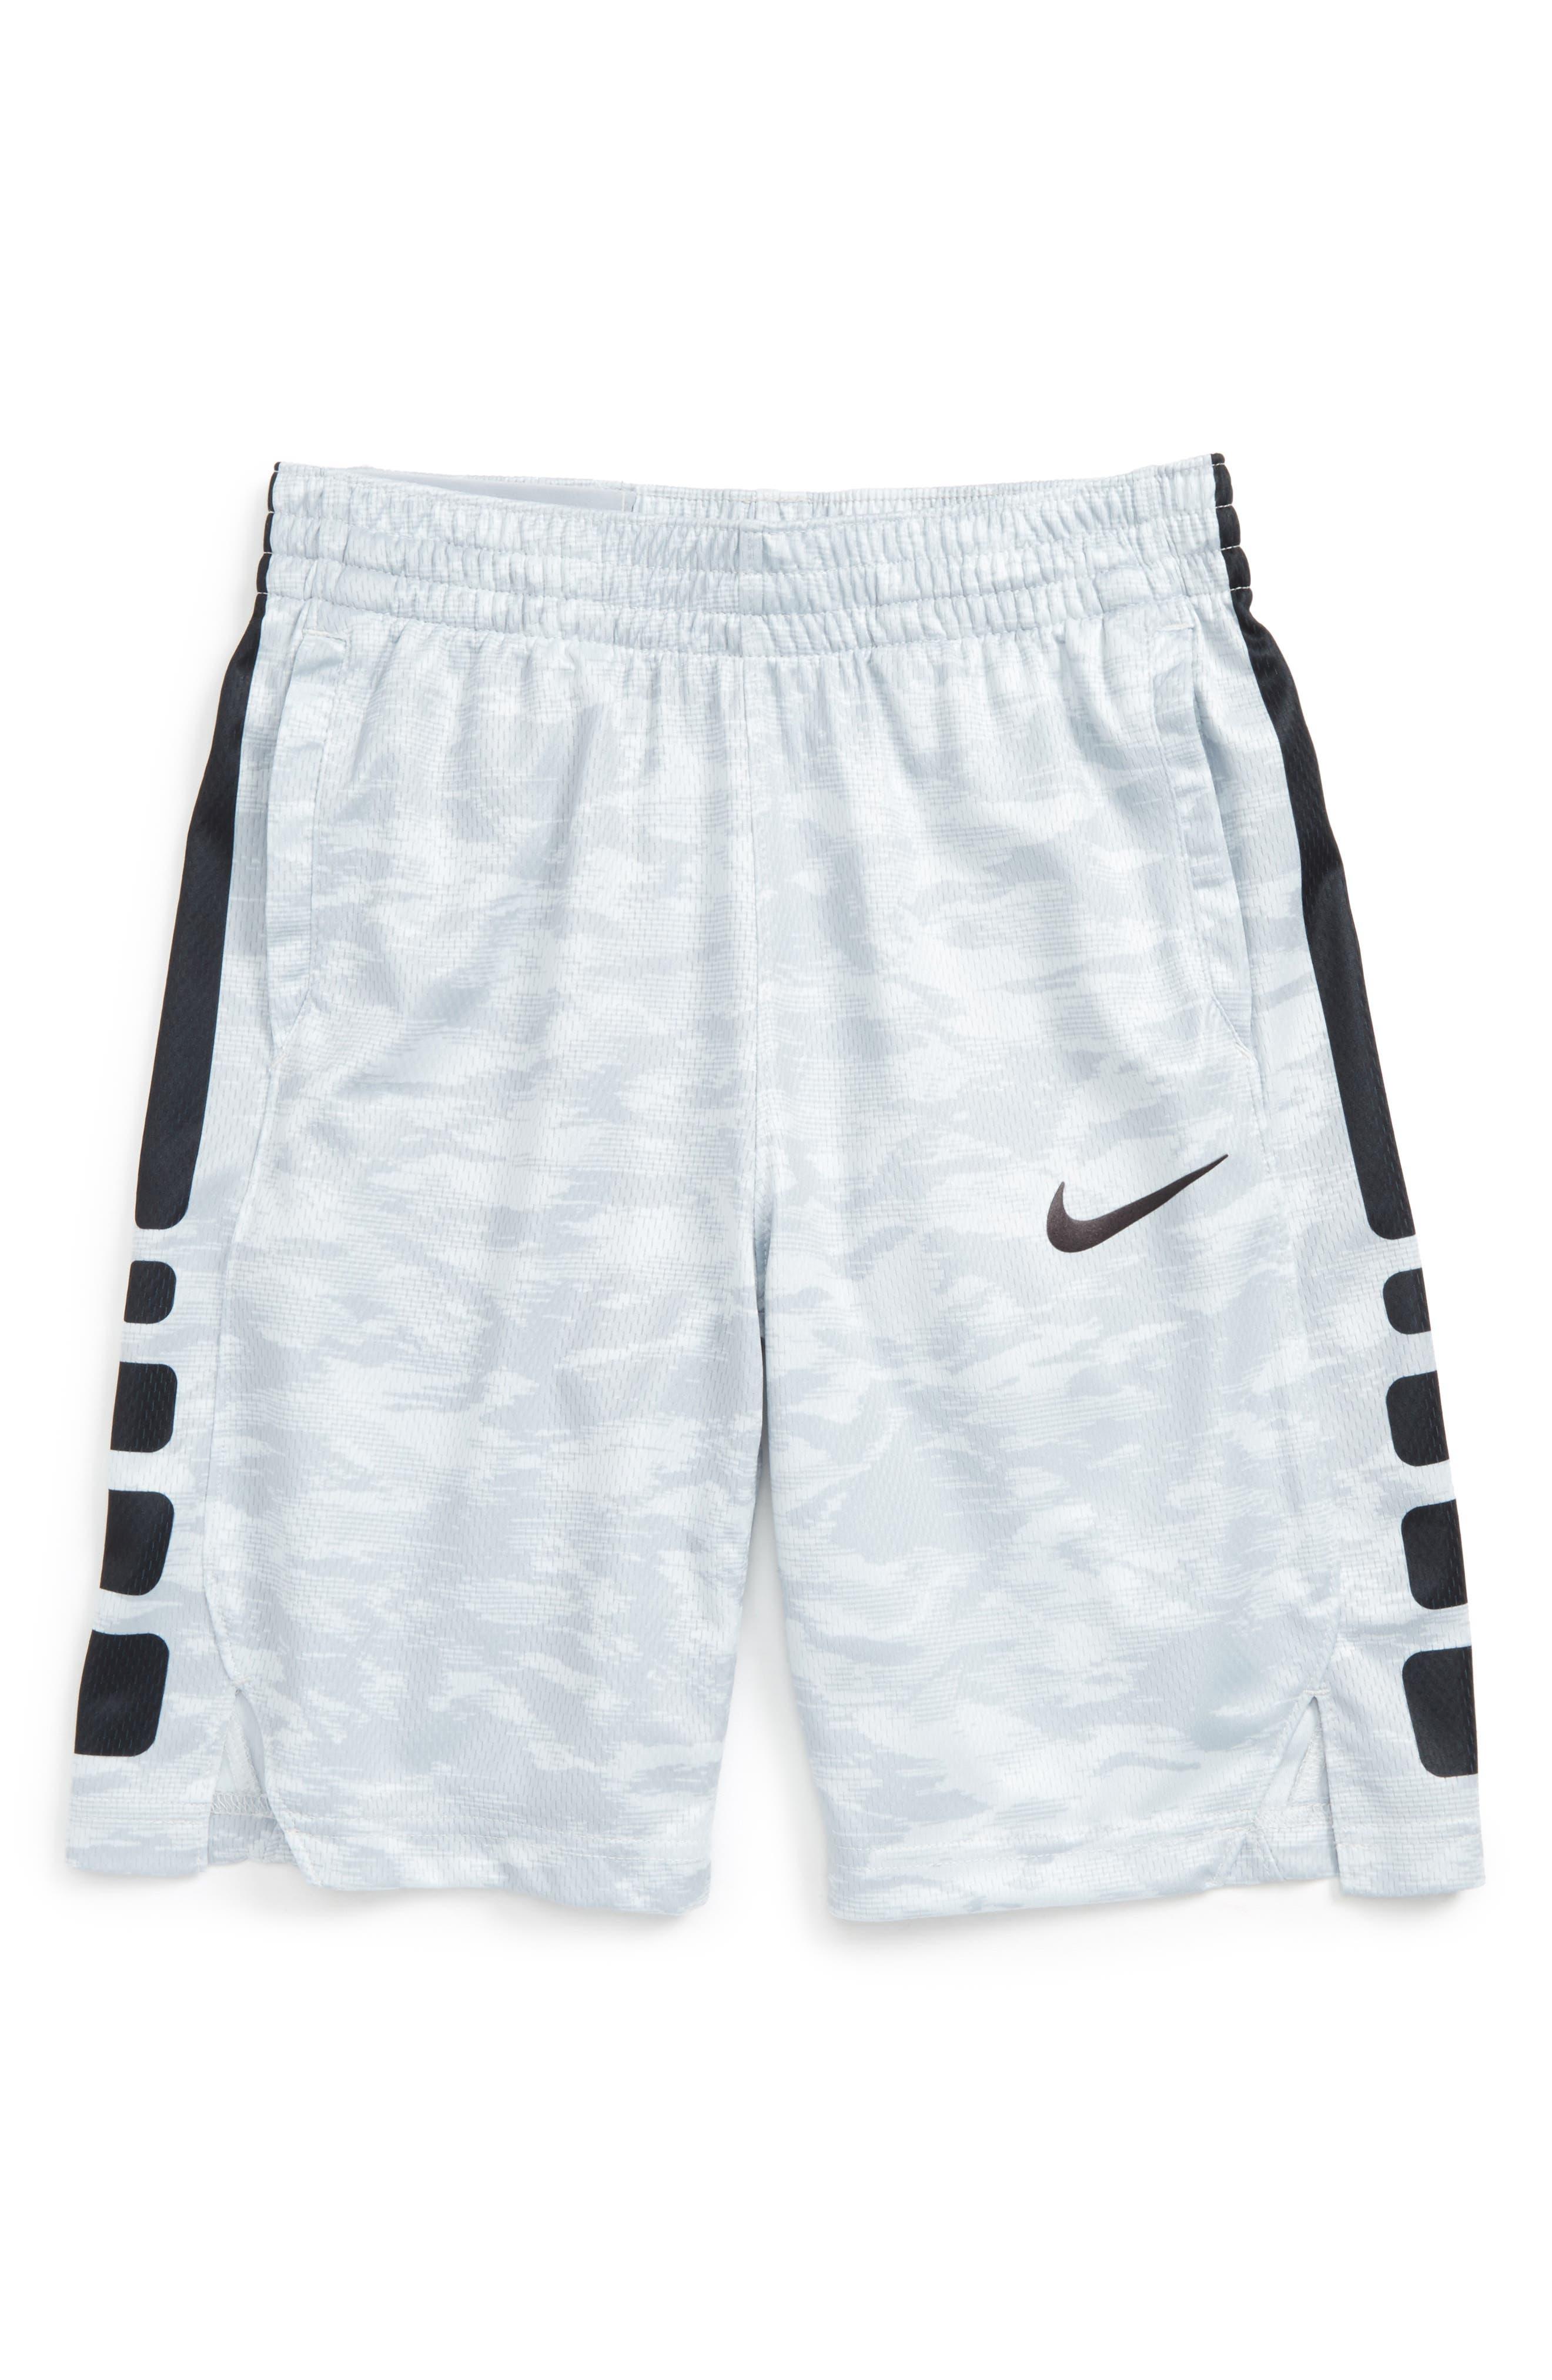 Dry Elite Basketball Shorts,                             Main thumbnail 2, color,